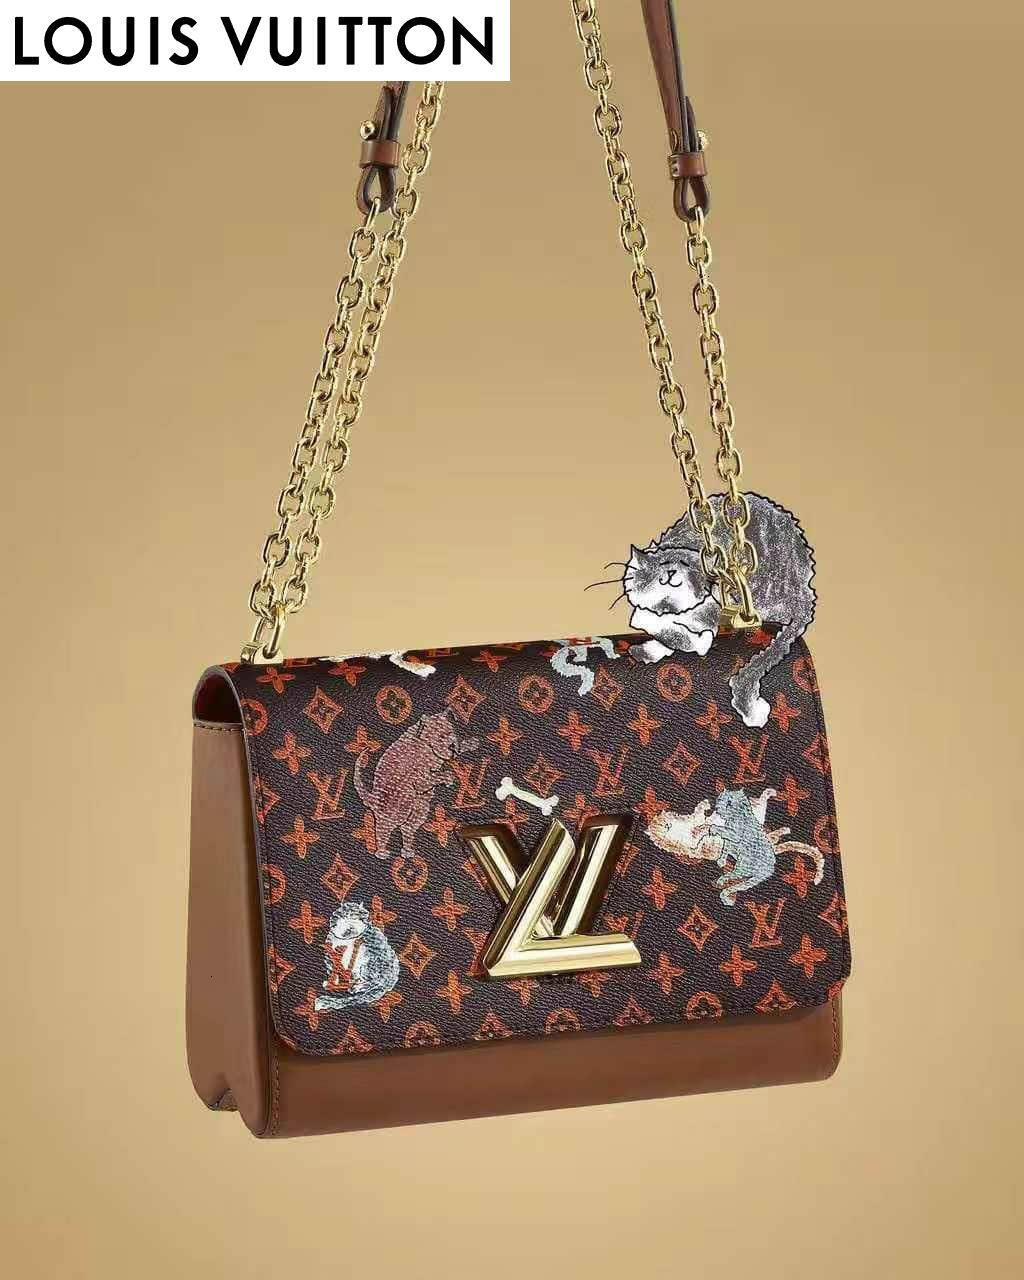 DCH4 Cat серии Twist Средние сумки M44408 ЖЕНЩИНЫ СУМКИ Iconic СУМКИ РУЧКИ Наплечные сумки TOTES CROSS BODY BAG КЛАТЧИ ВЕЧЕР